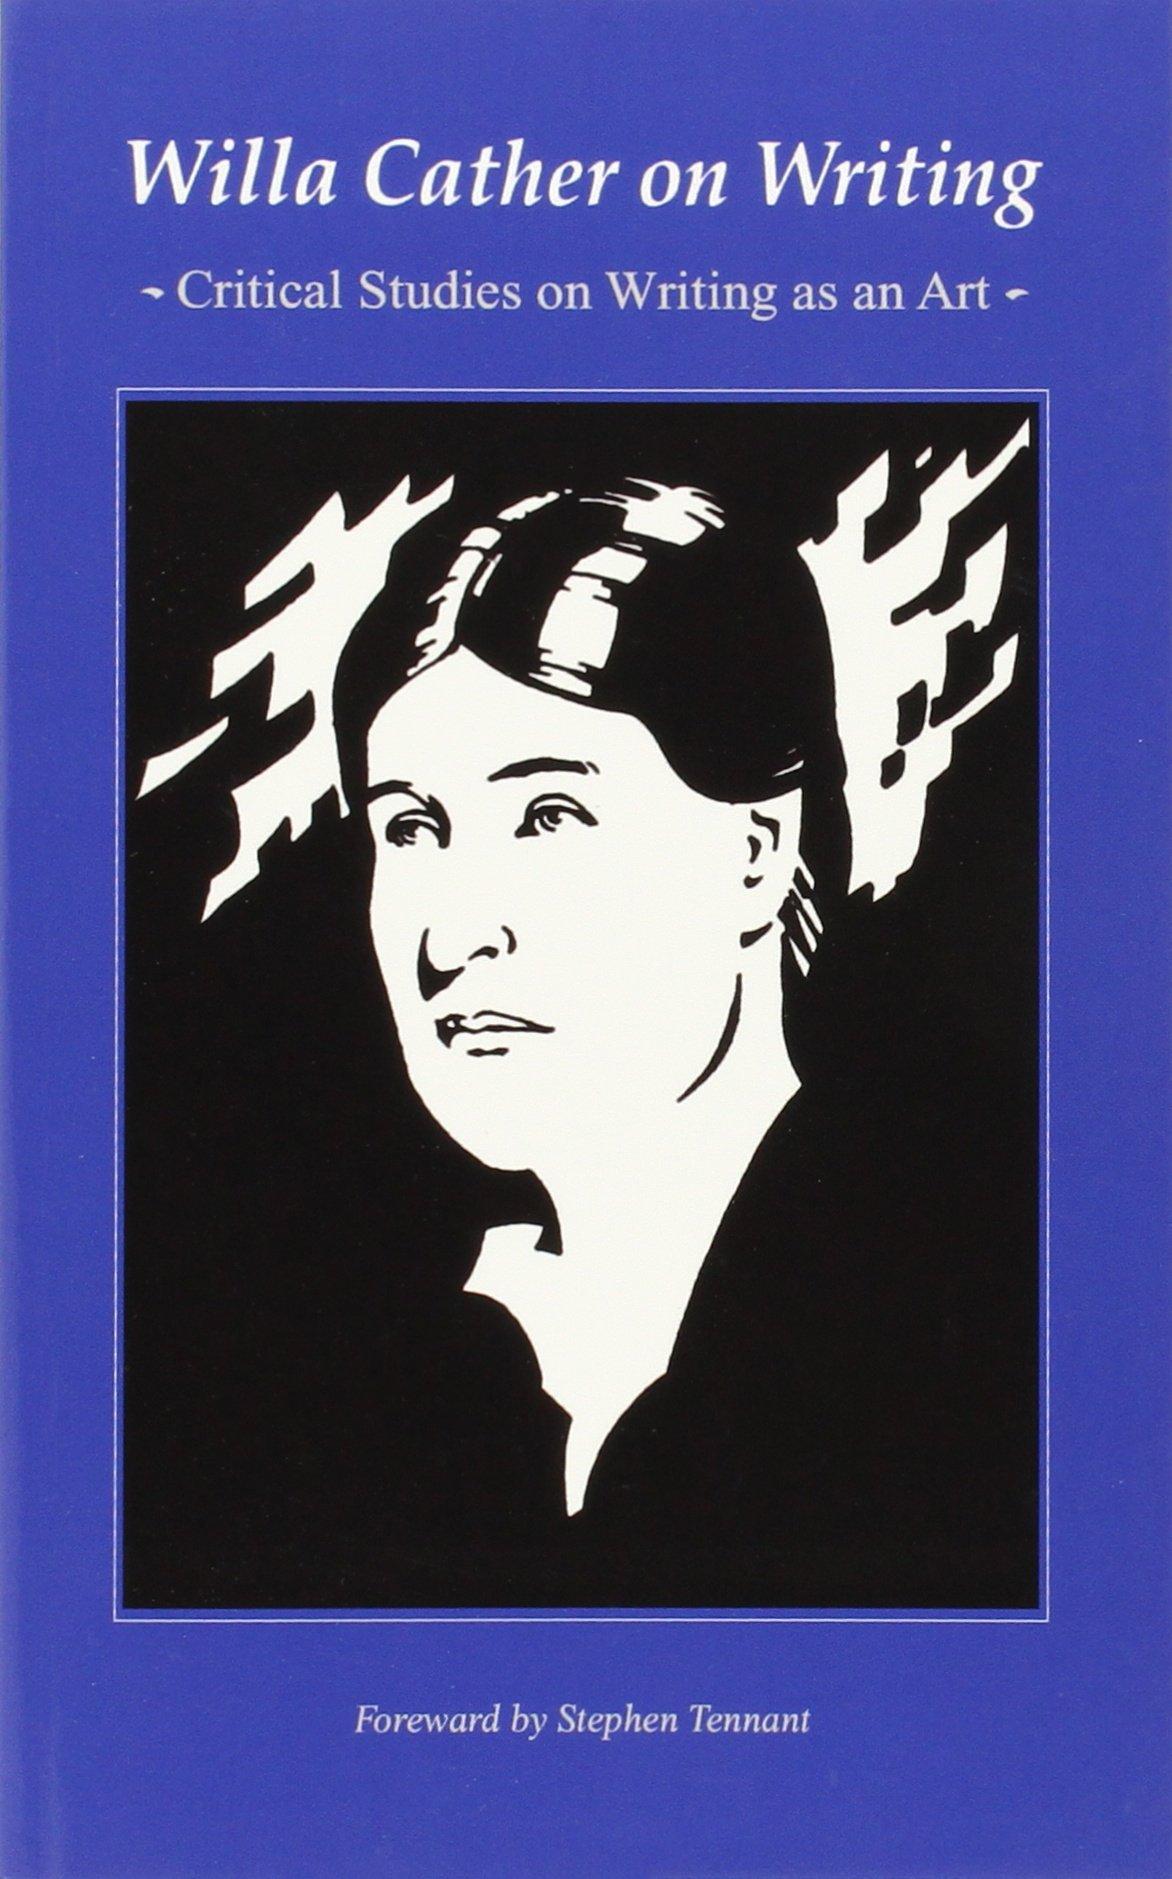 Amazon.com: Willa Cather on Writing: Critical Studies on Writing as an Art  (9780803263321): Willa Cather: Books